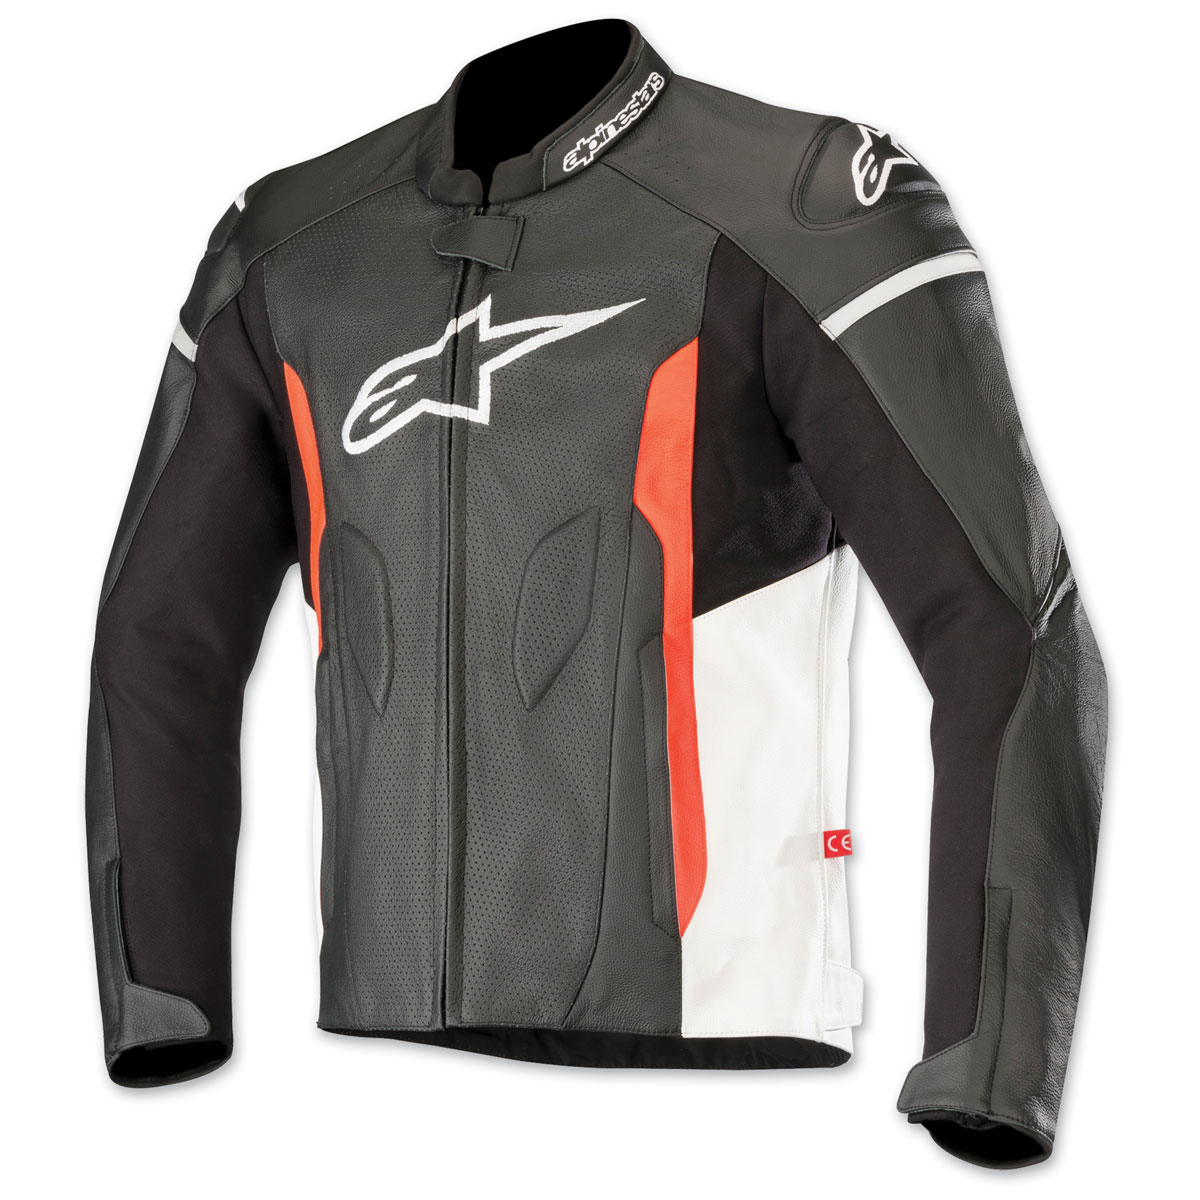 Alpinestars Men's Faster Airflow Black/White/Red Leather Jacket